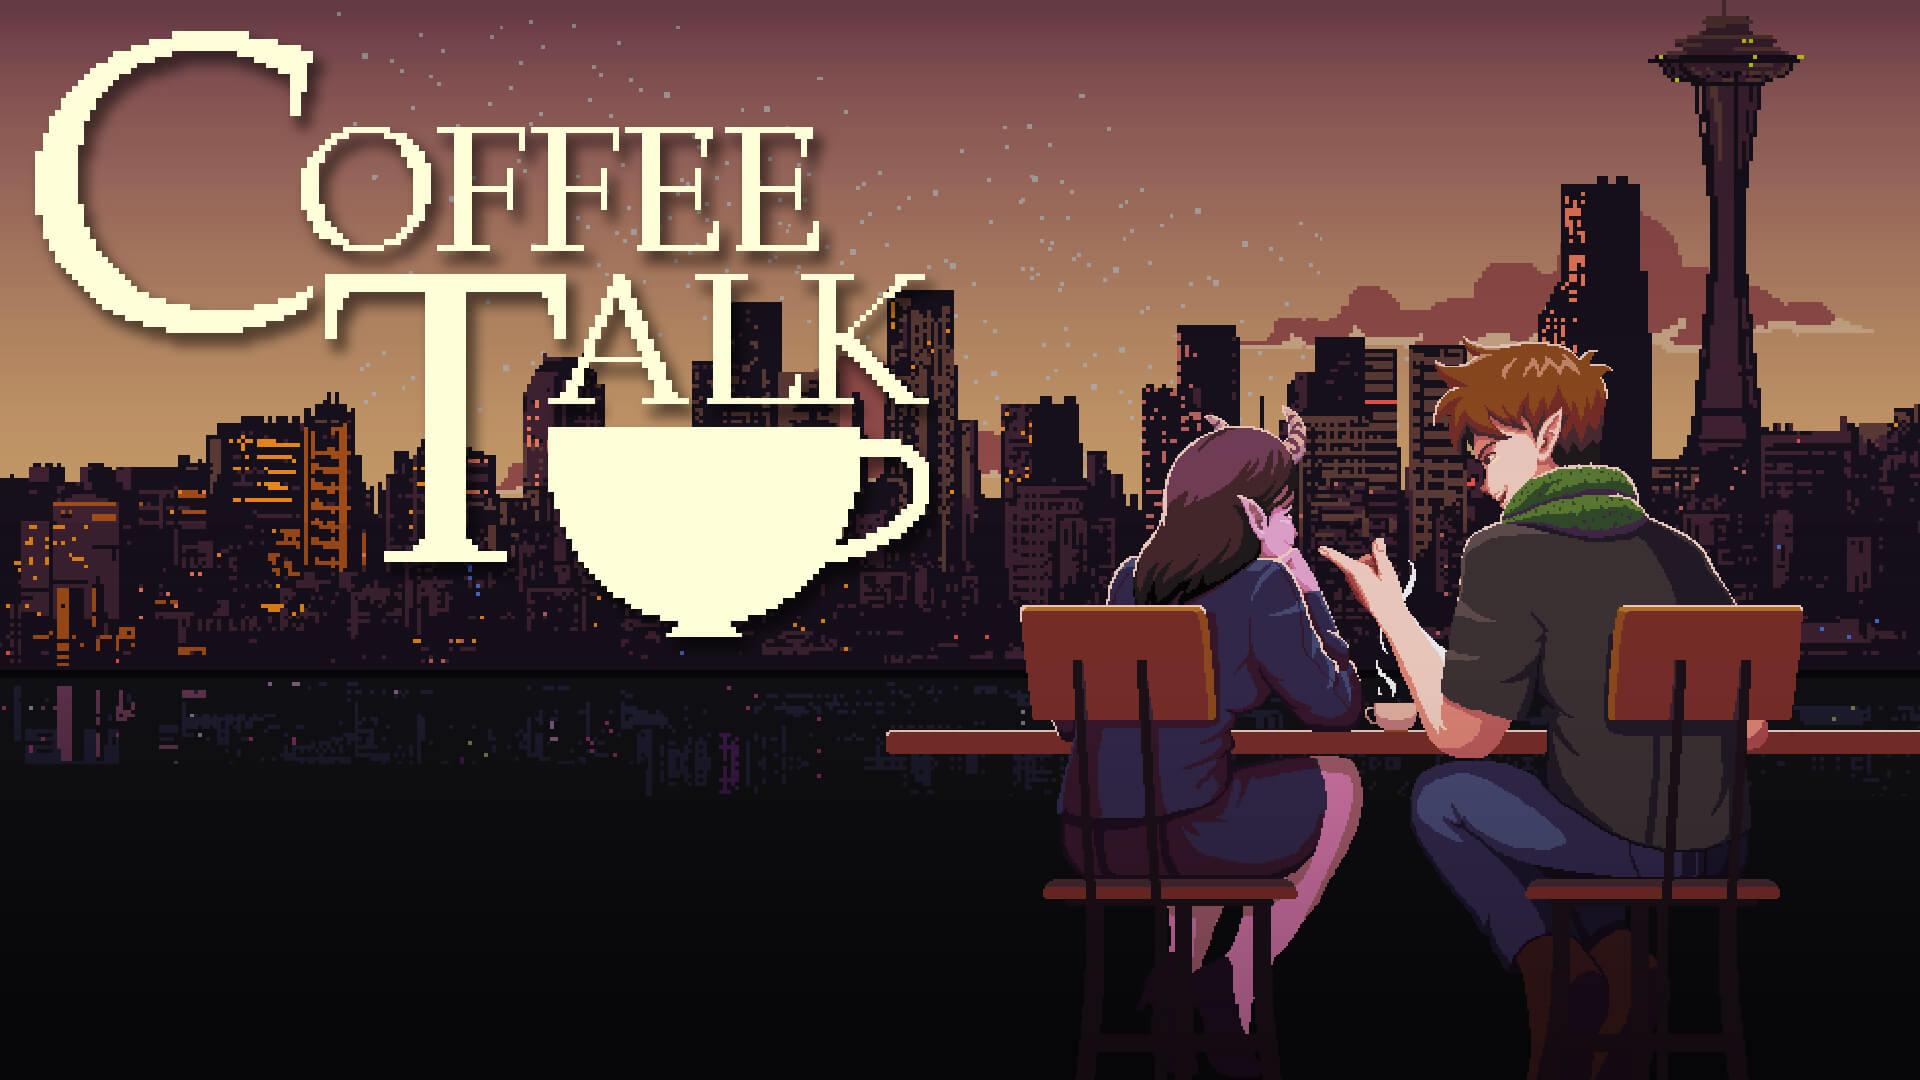 Coffee Talk Free PC Download